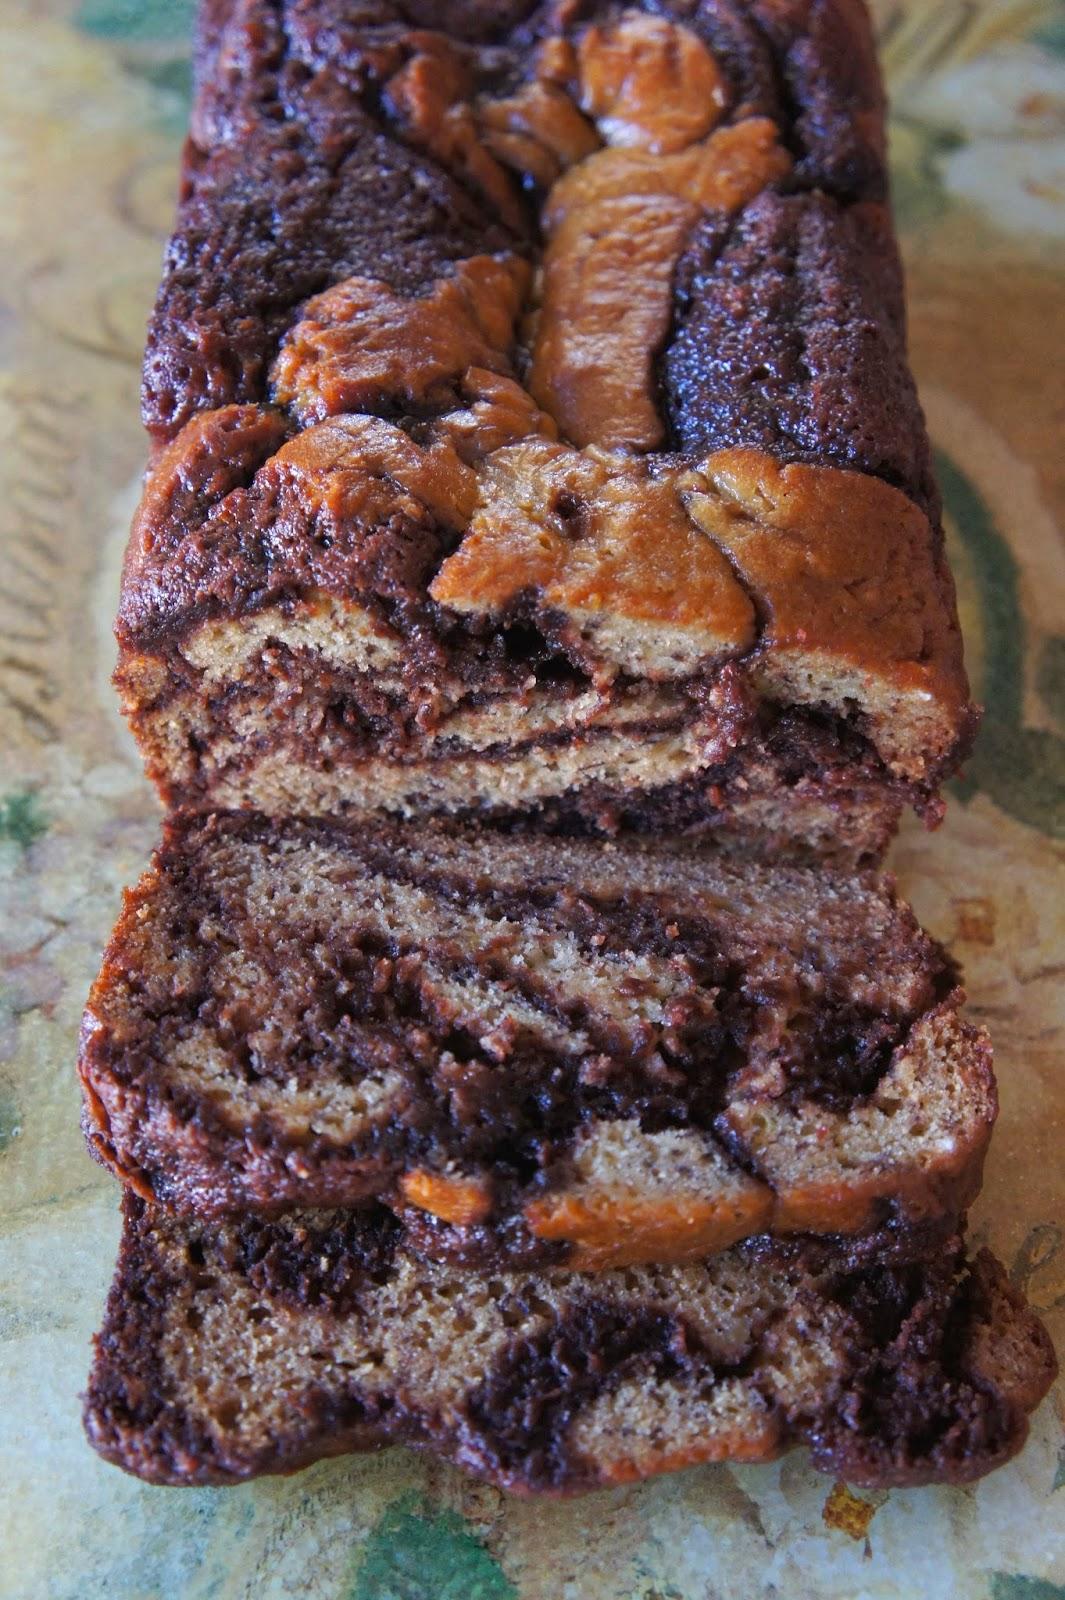 Mocha Cappuccino Hazelnut Banana Bread: Savory Sweet and Satsifying